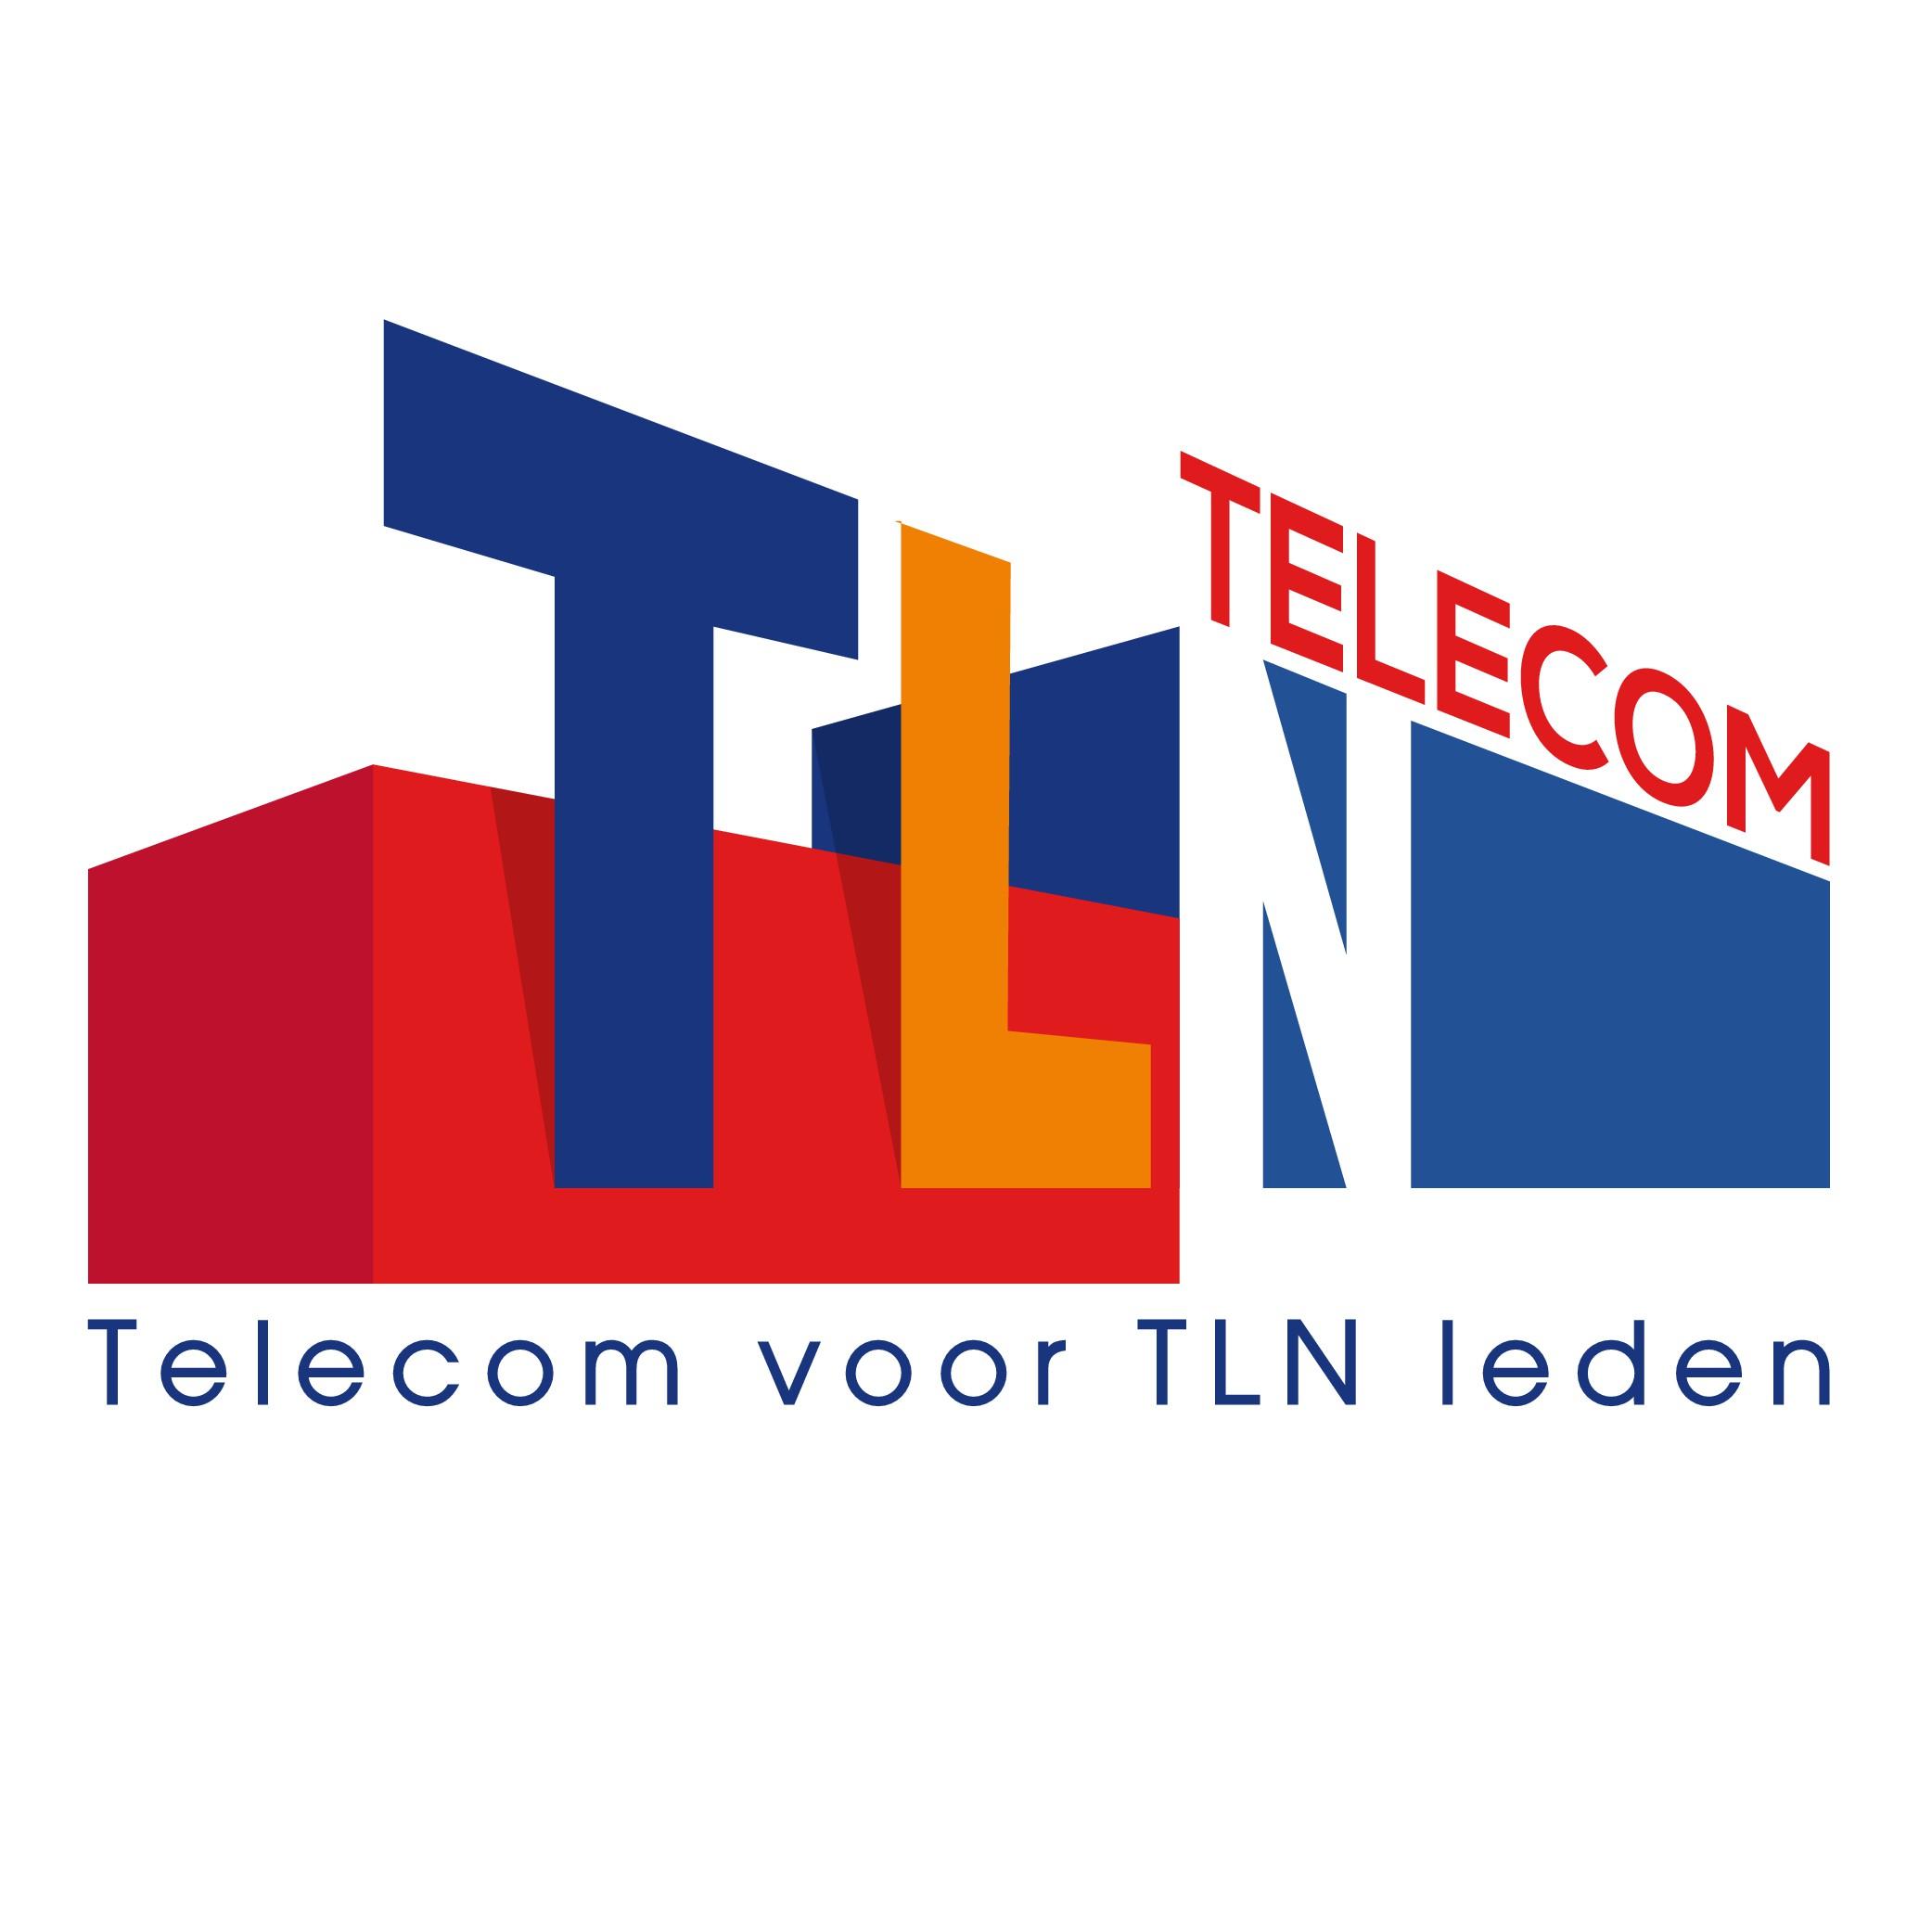 A modern Logo and clear website for a telecom company!